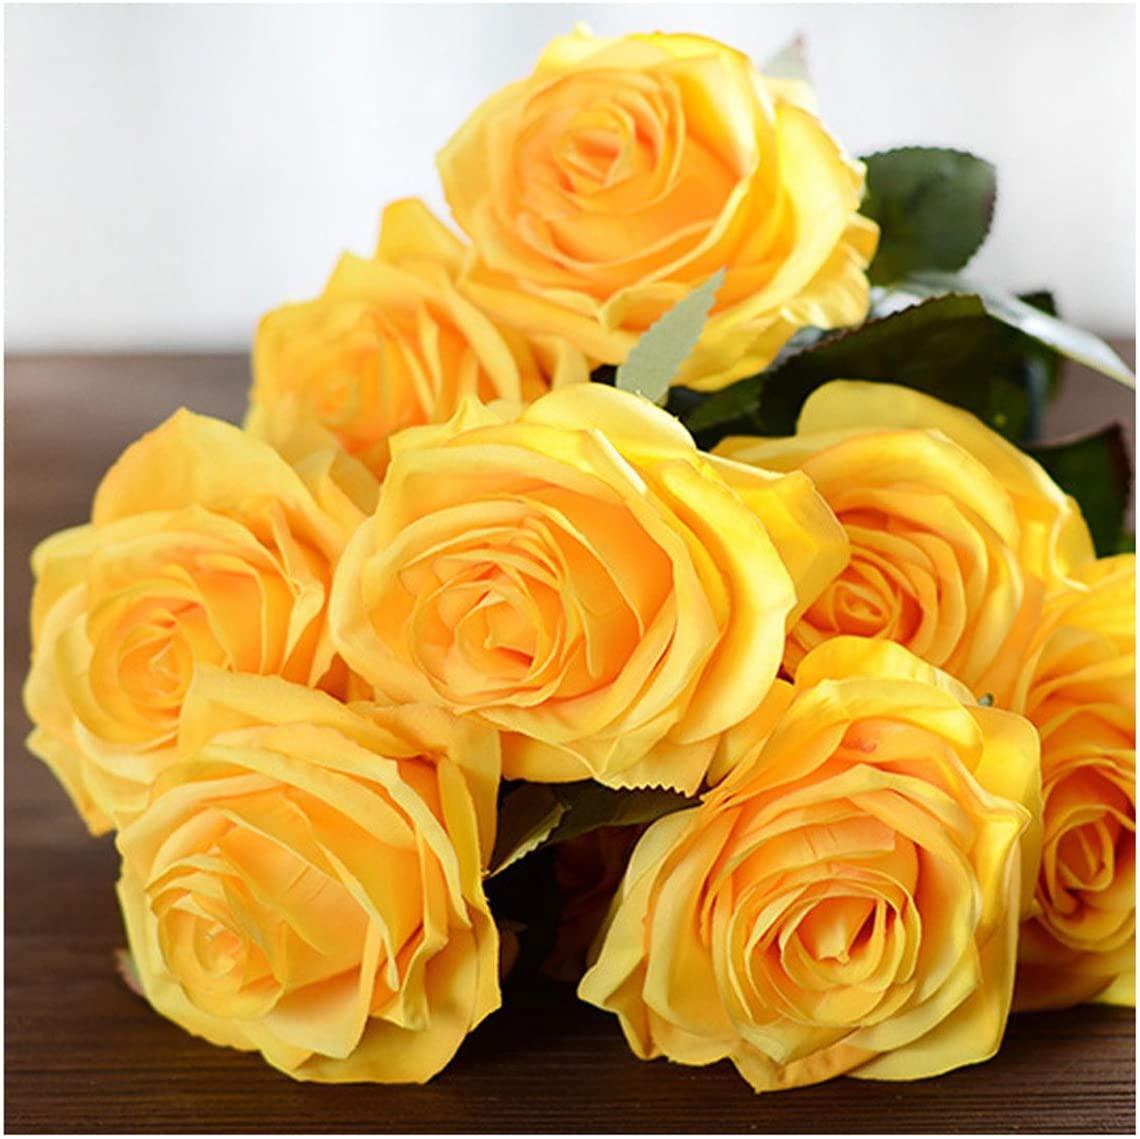 ECYC Rose Floral Bouquet Rayon Fake Flower Flower Arrangement Table Wedding Flowers Decoration Party Accessories